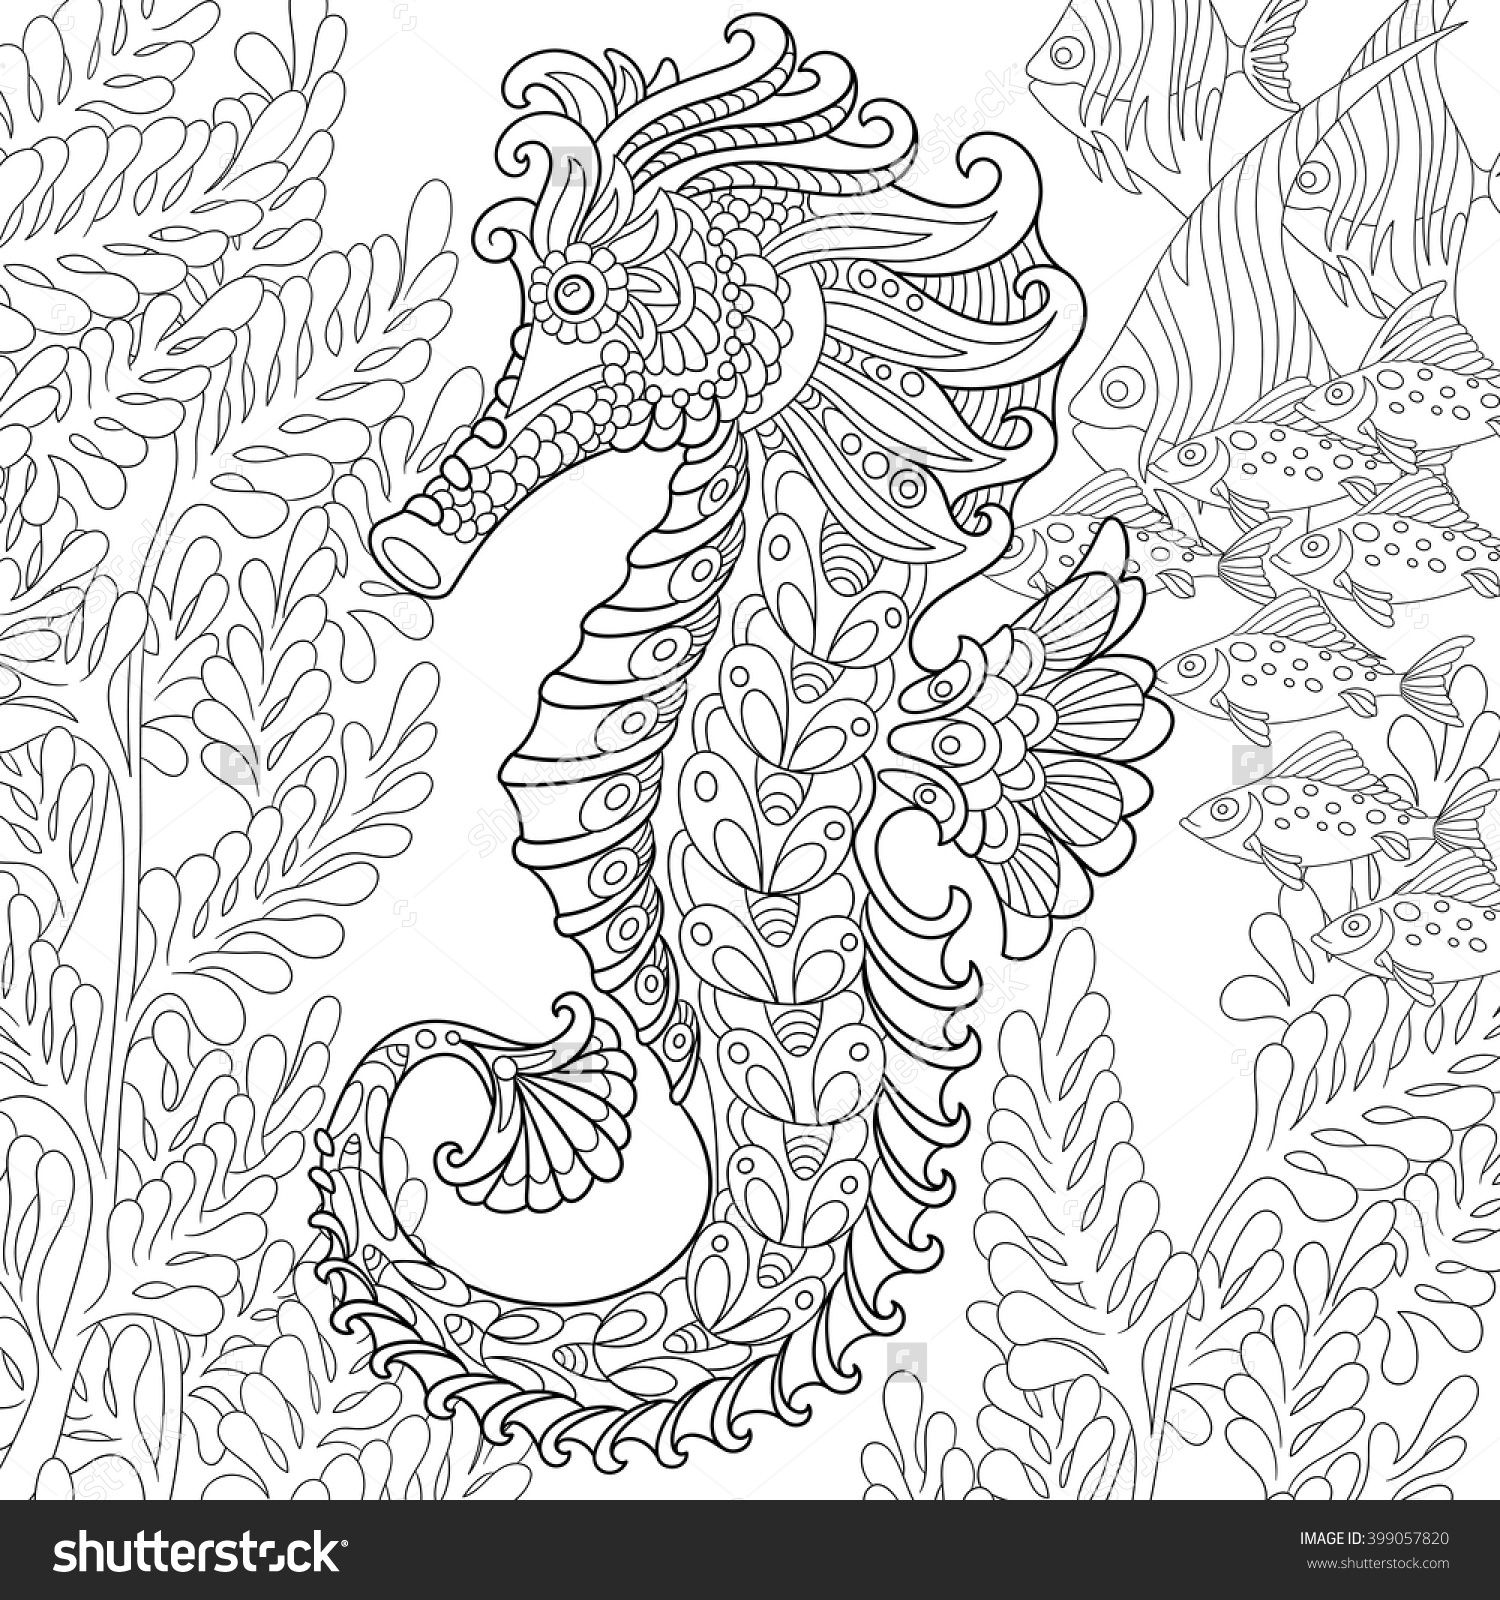 Zentangle stylized cartoon seahorse and tropical fish among seaweed ...